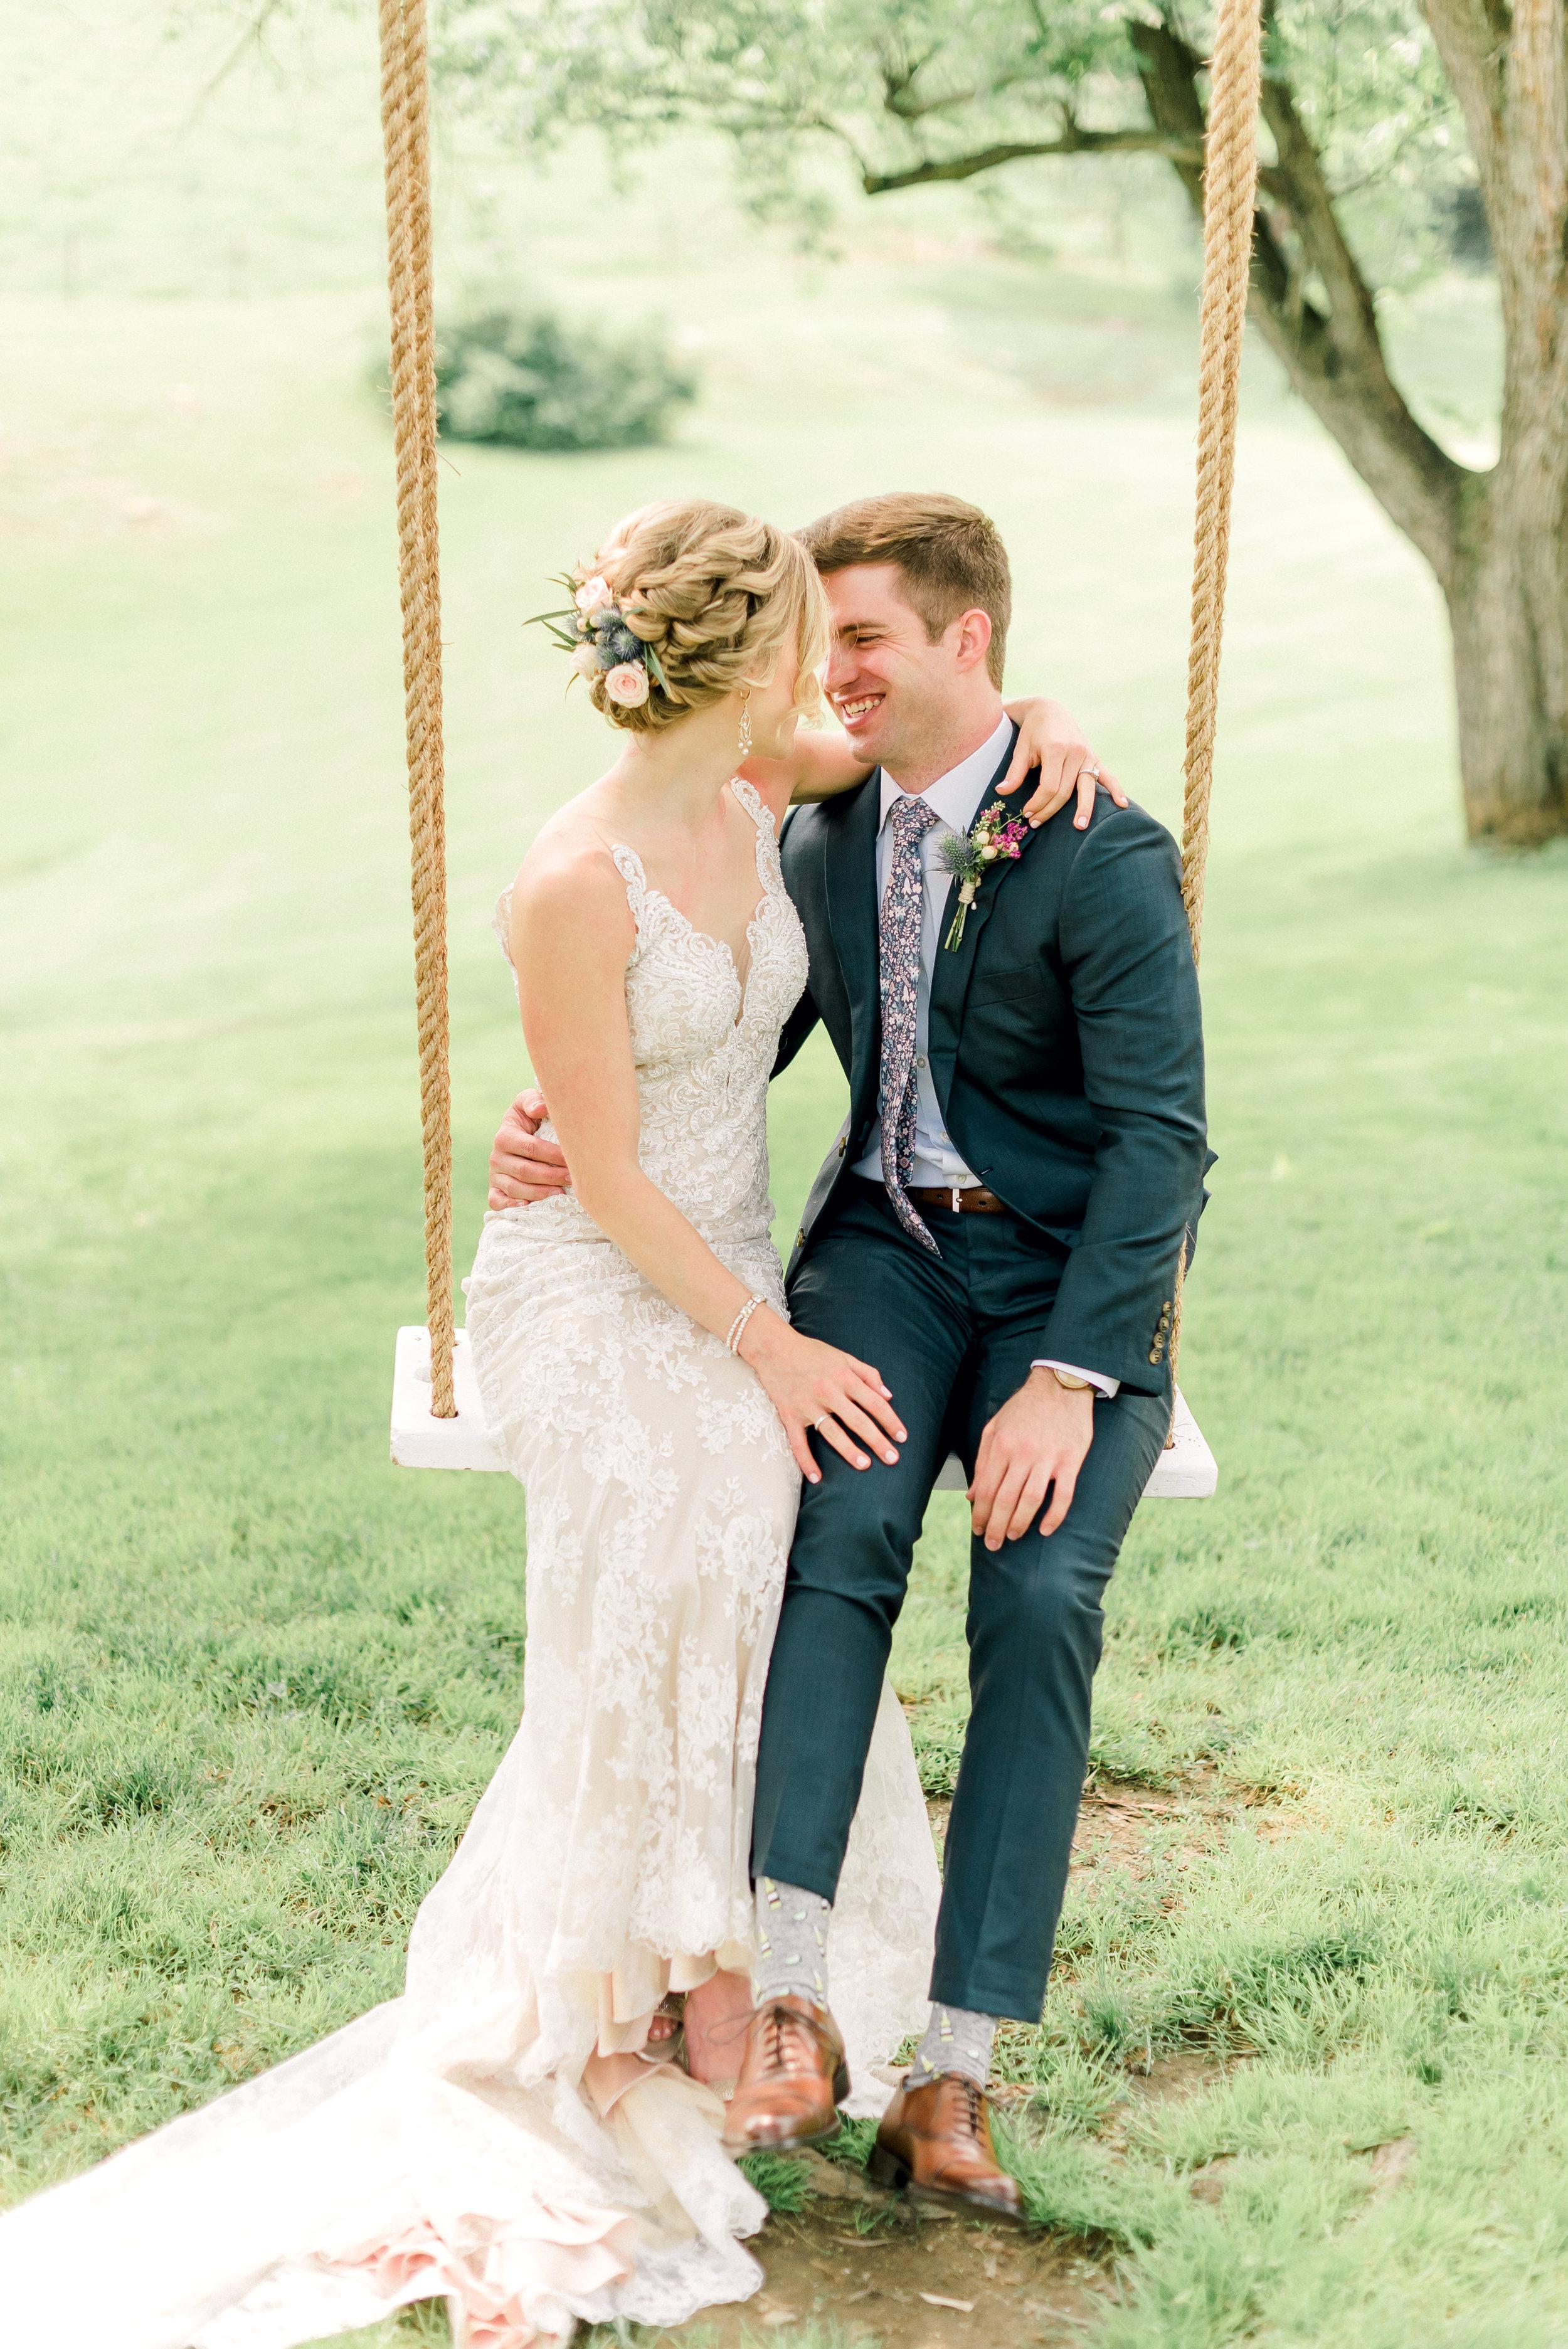 pittsburgh-wedding-photographer-shady-elms-farm-0020.jpg